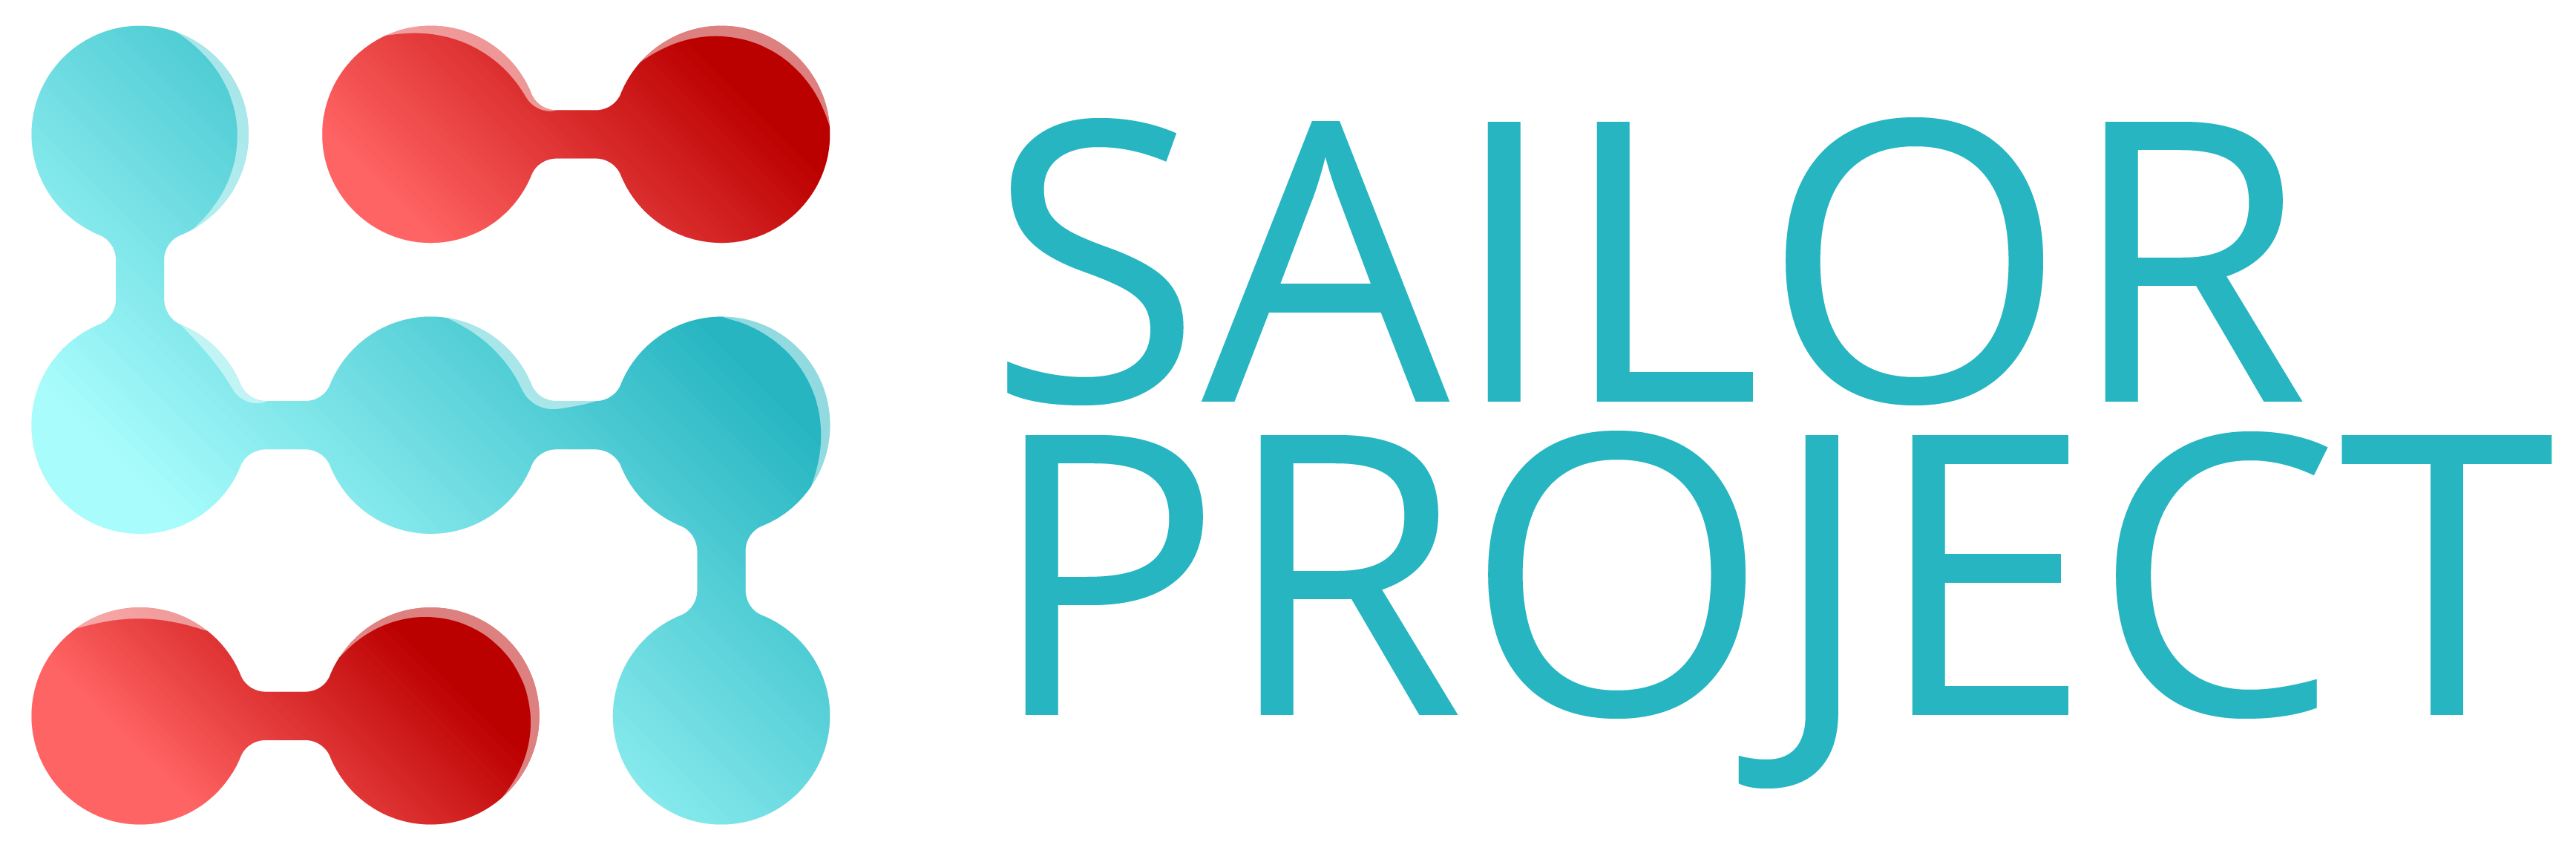 Sailor Project logo